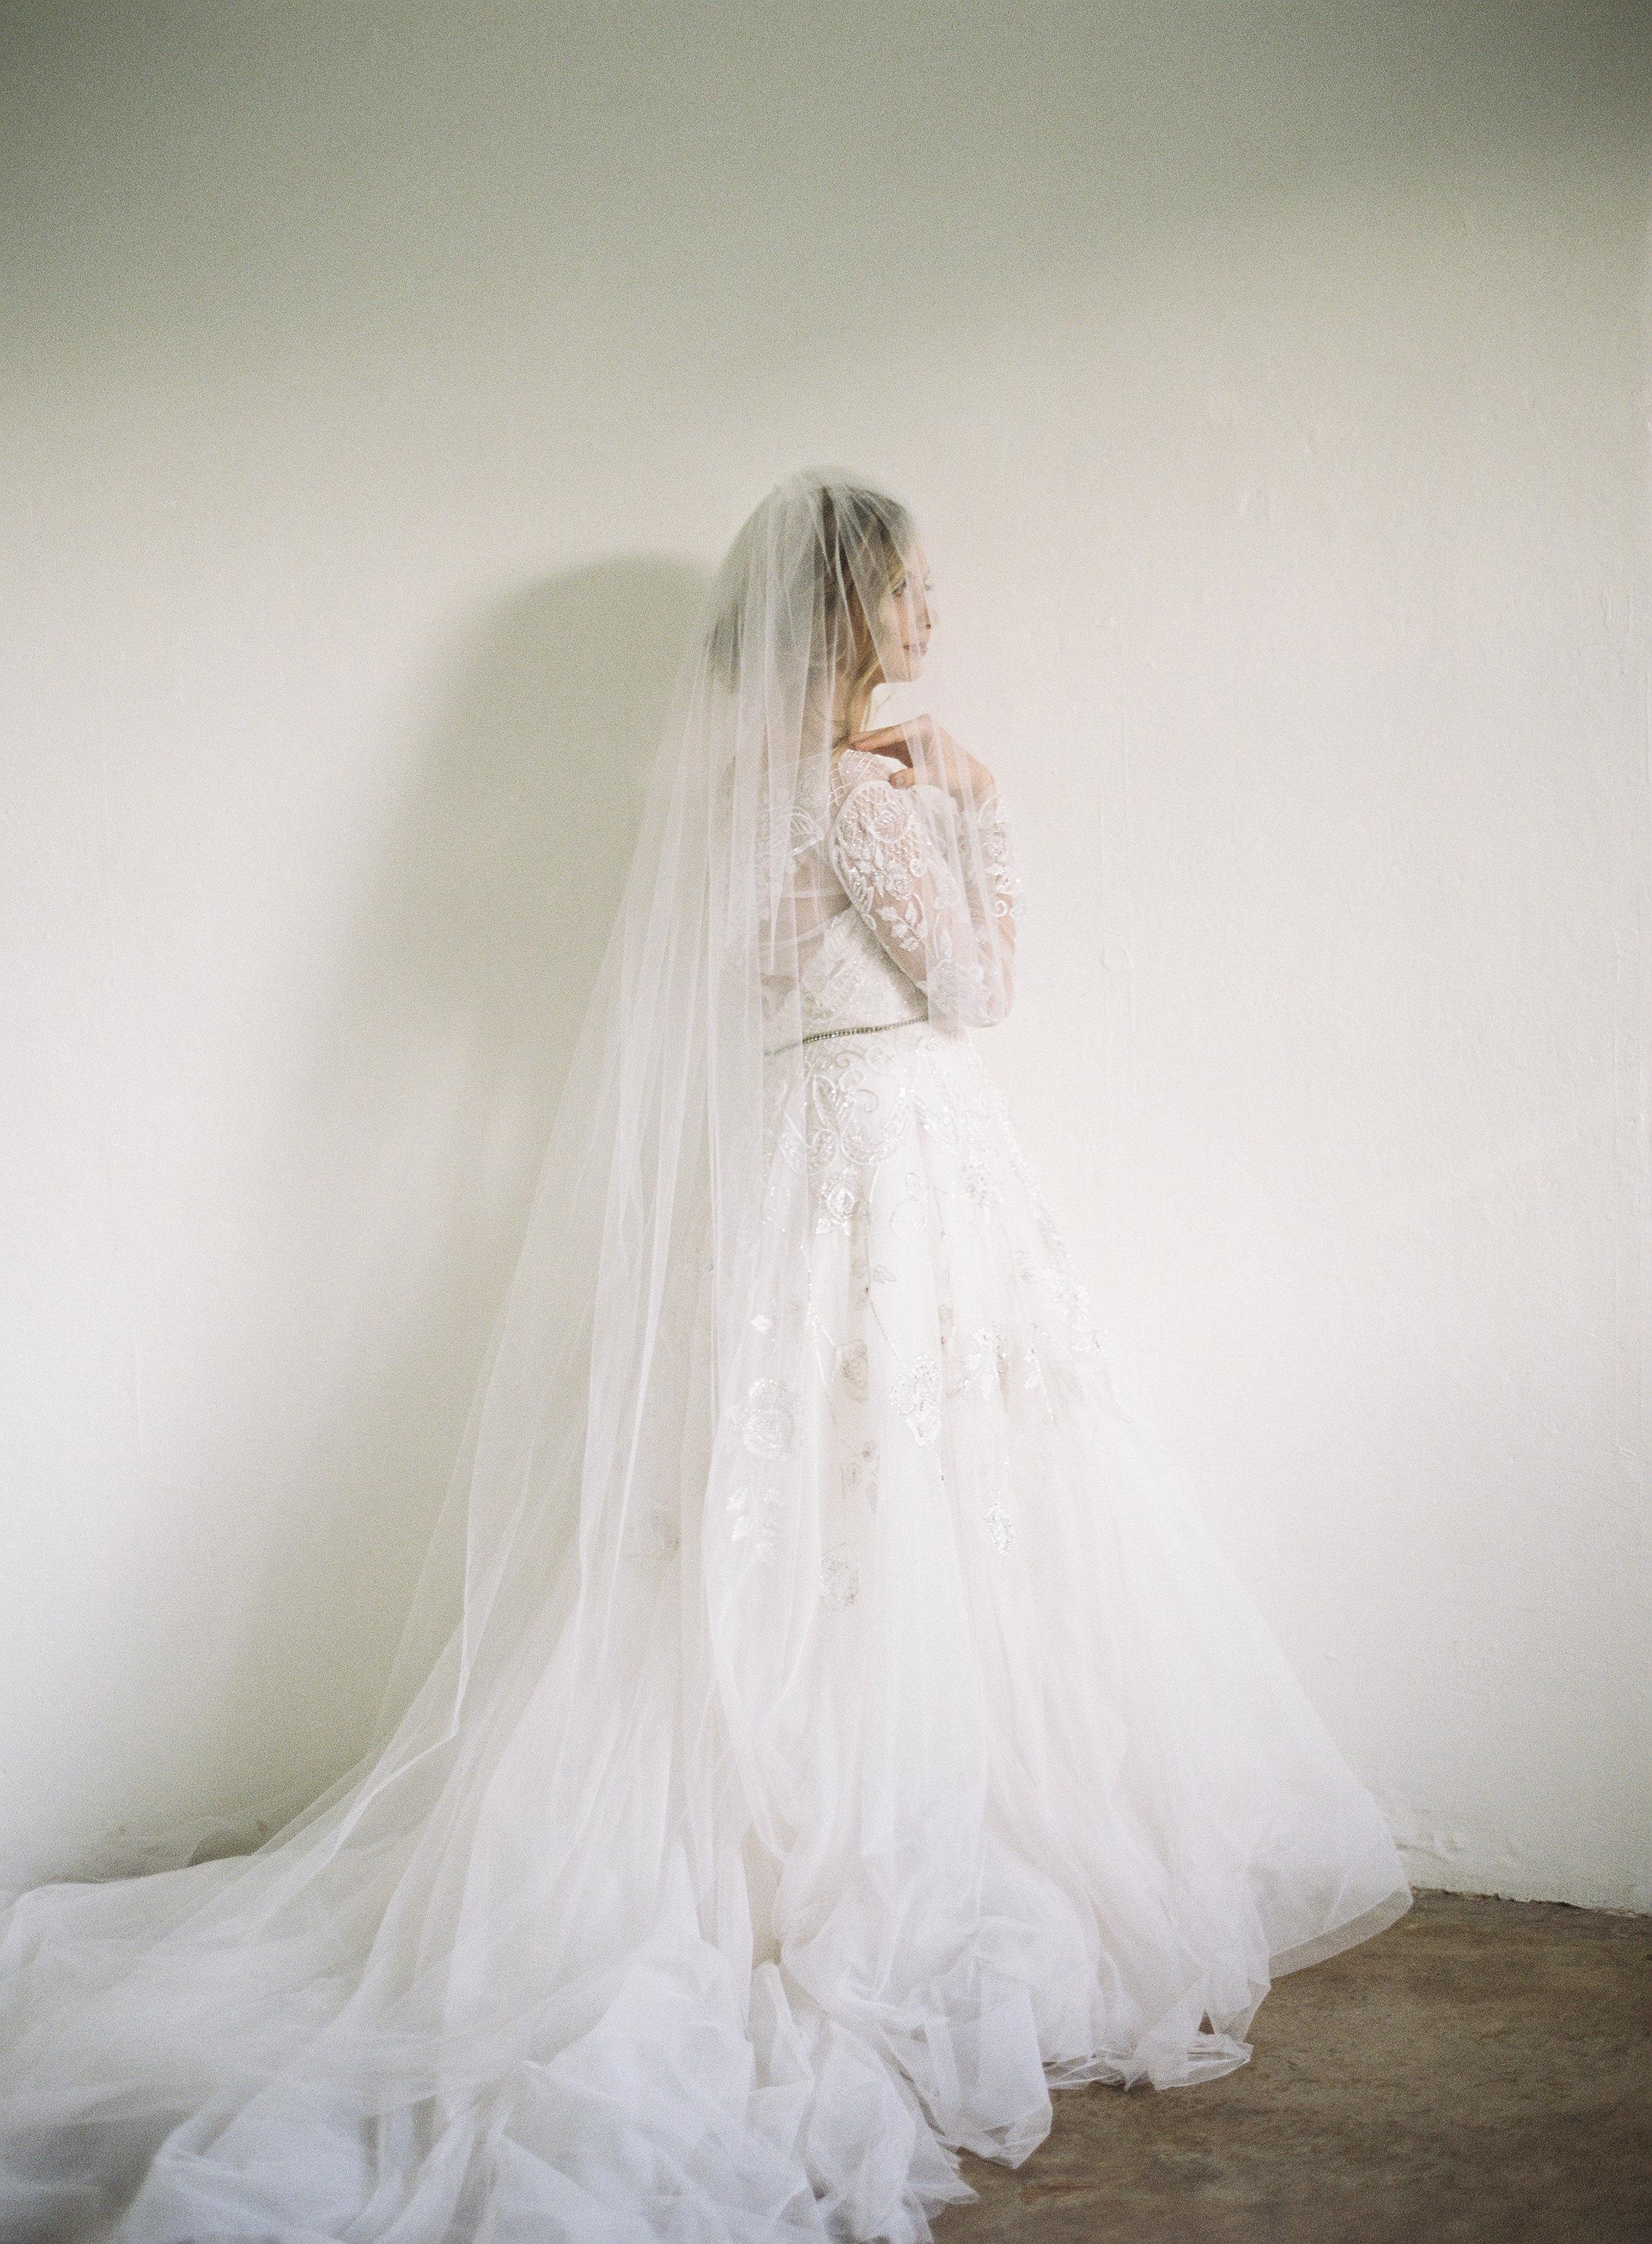 Reynolda Barn - Allison Kuhn Photography0220.jpg